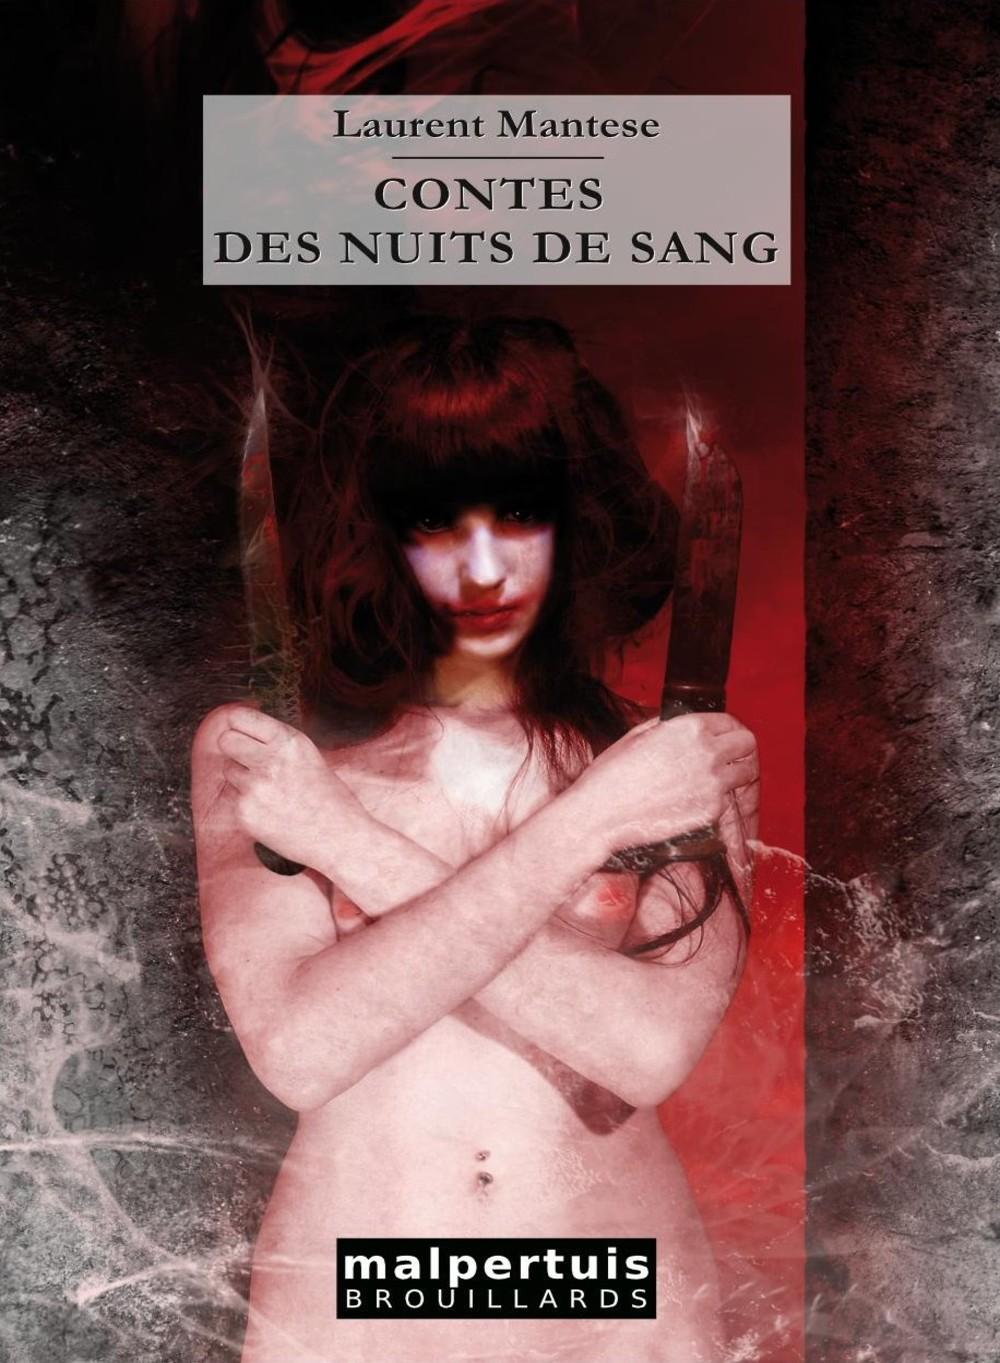 Contes_des_nuits_de_sang